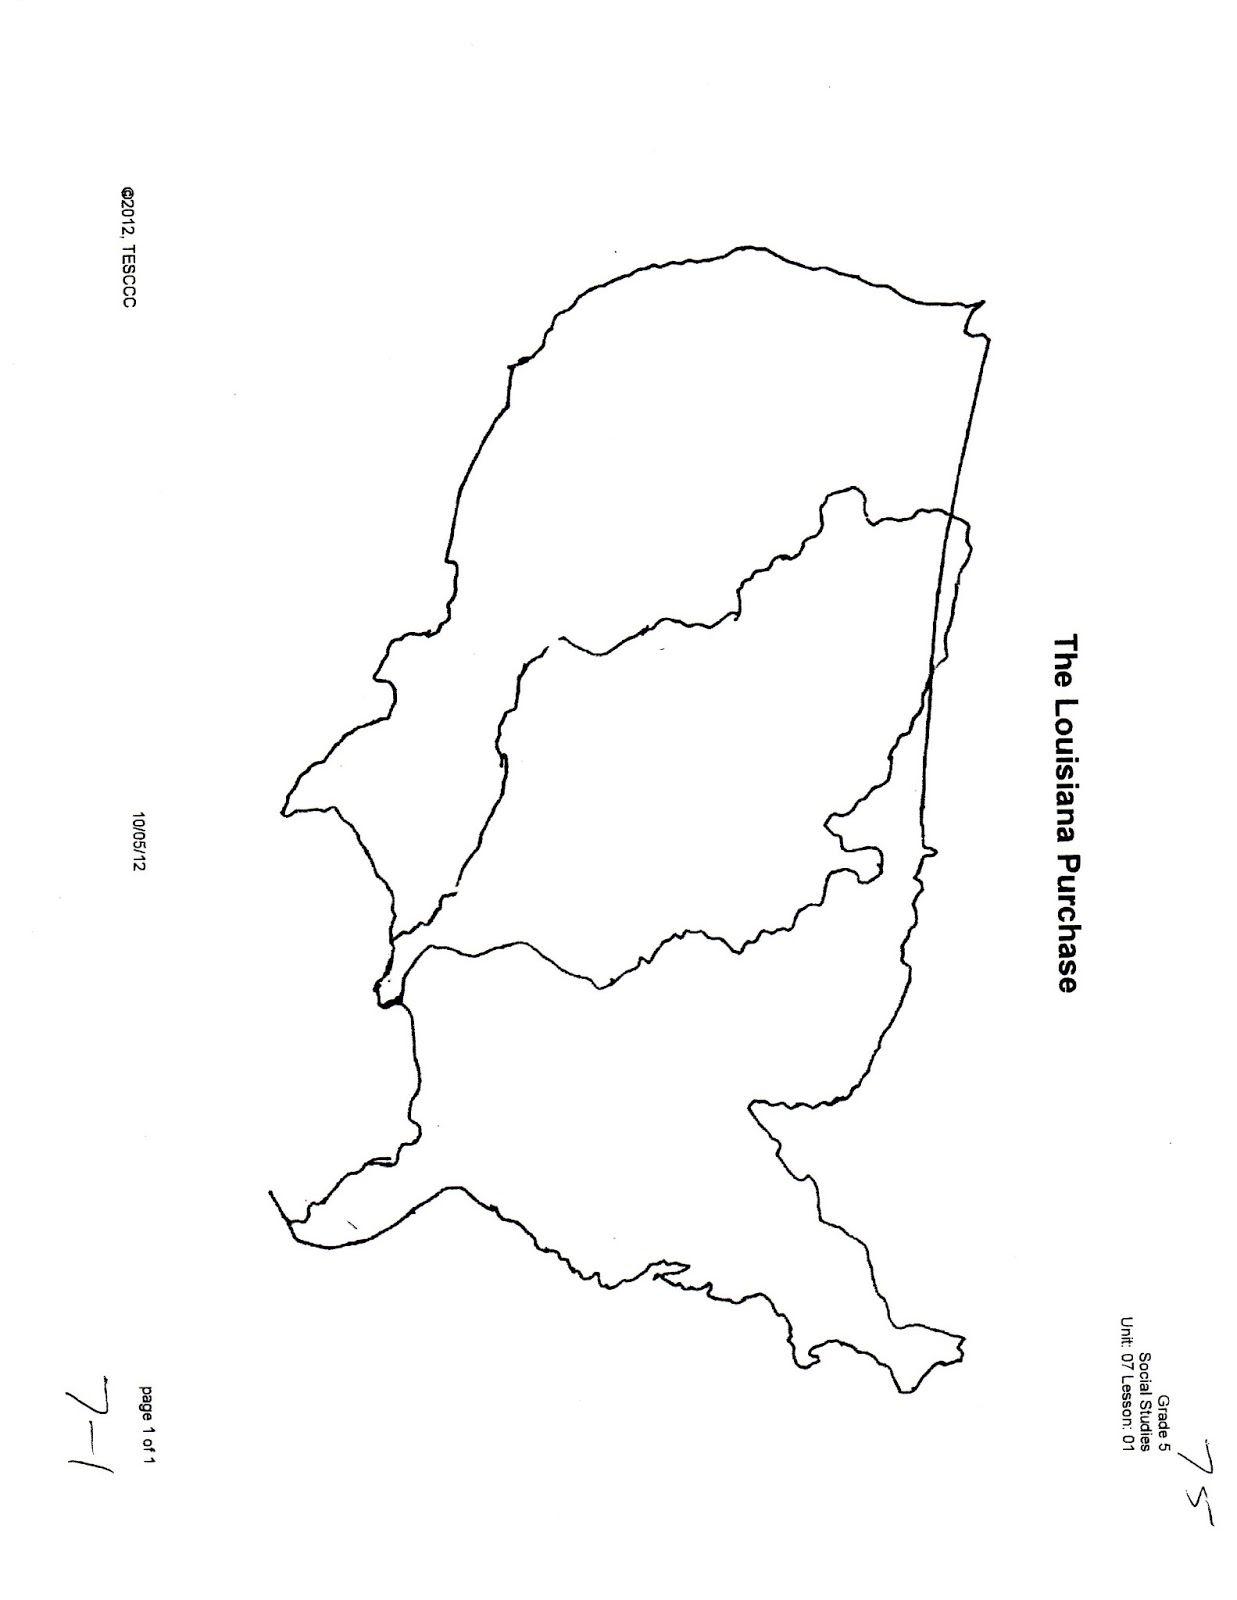 Worksheets Louisiana Purchase Map Worksheet louisiana purchase map worksheet delibertad classroom ideas pinterest maps use with worksheet